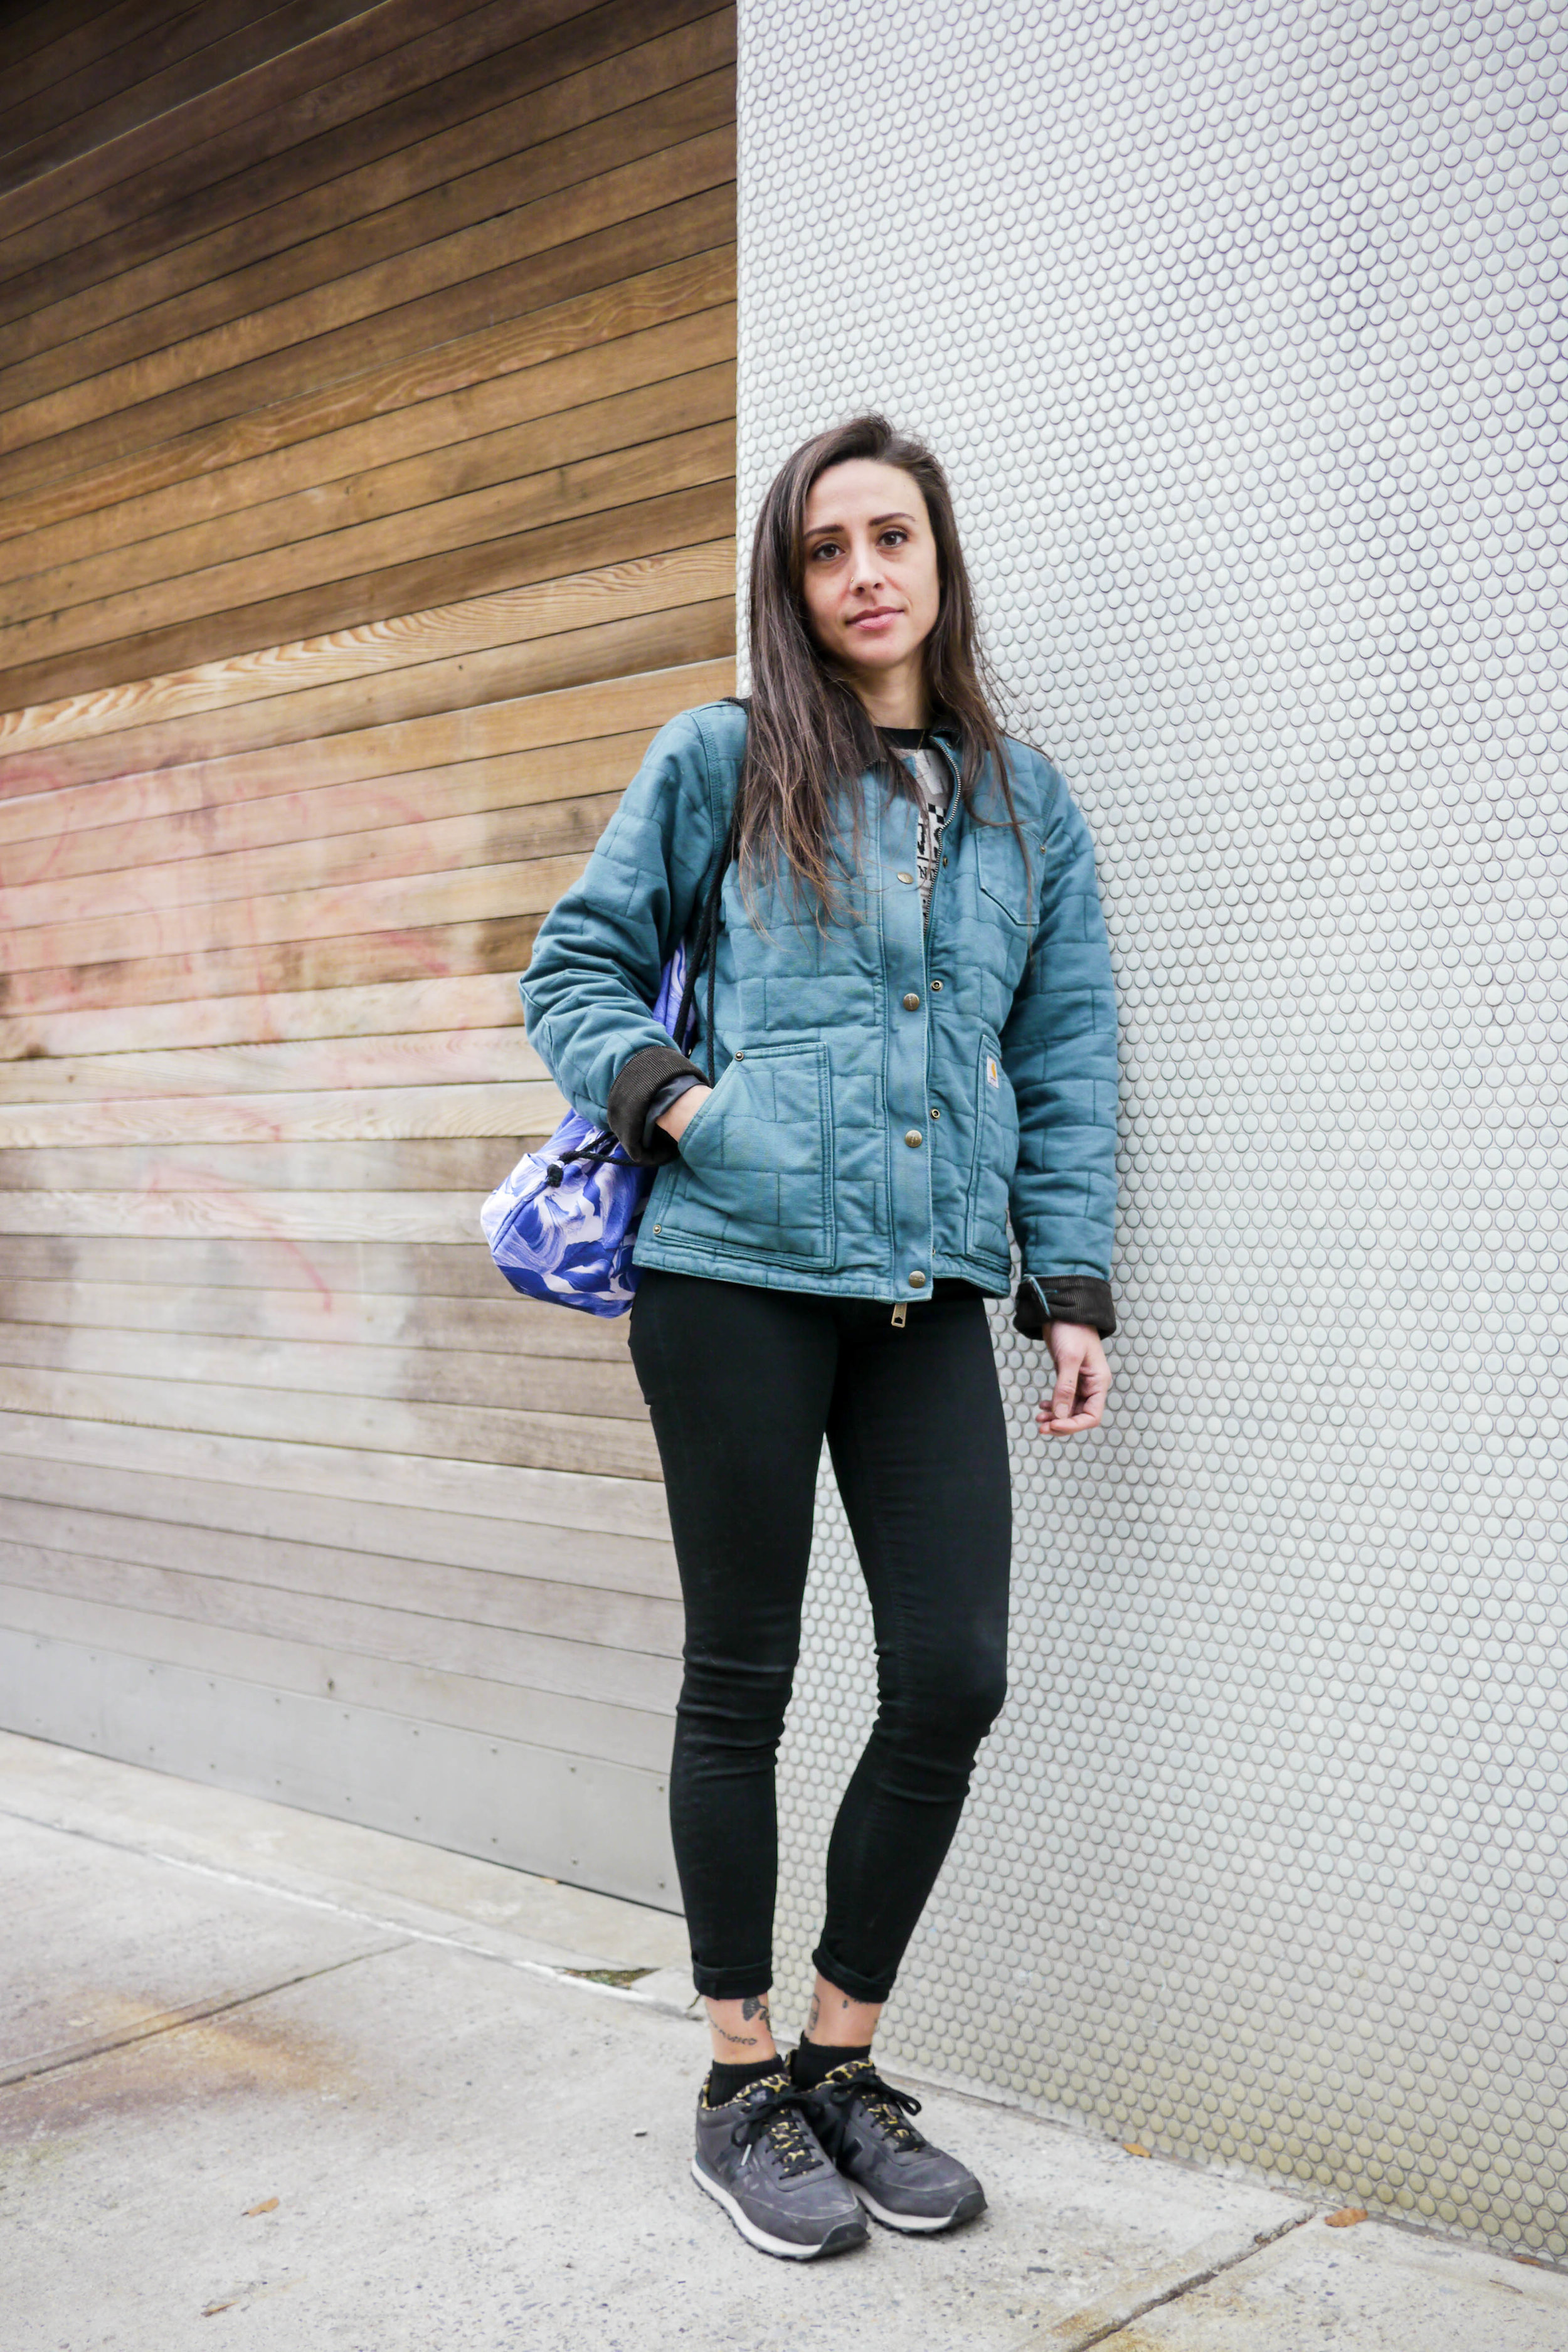 Top: Viva Vena, Jacket: Carhartt,    Jeans: Acne   ,    Shoes: New Balance   ,    Bag: Mansi Shah